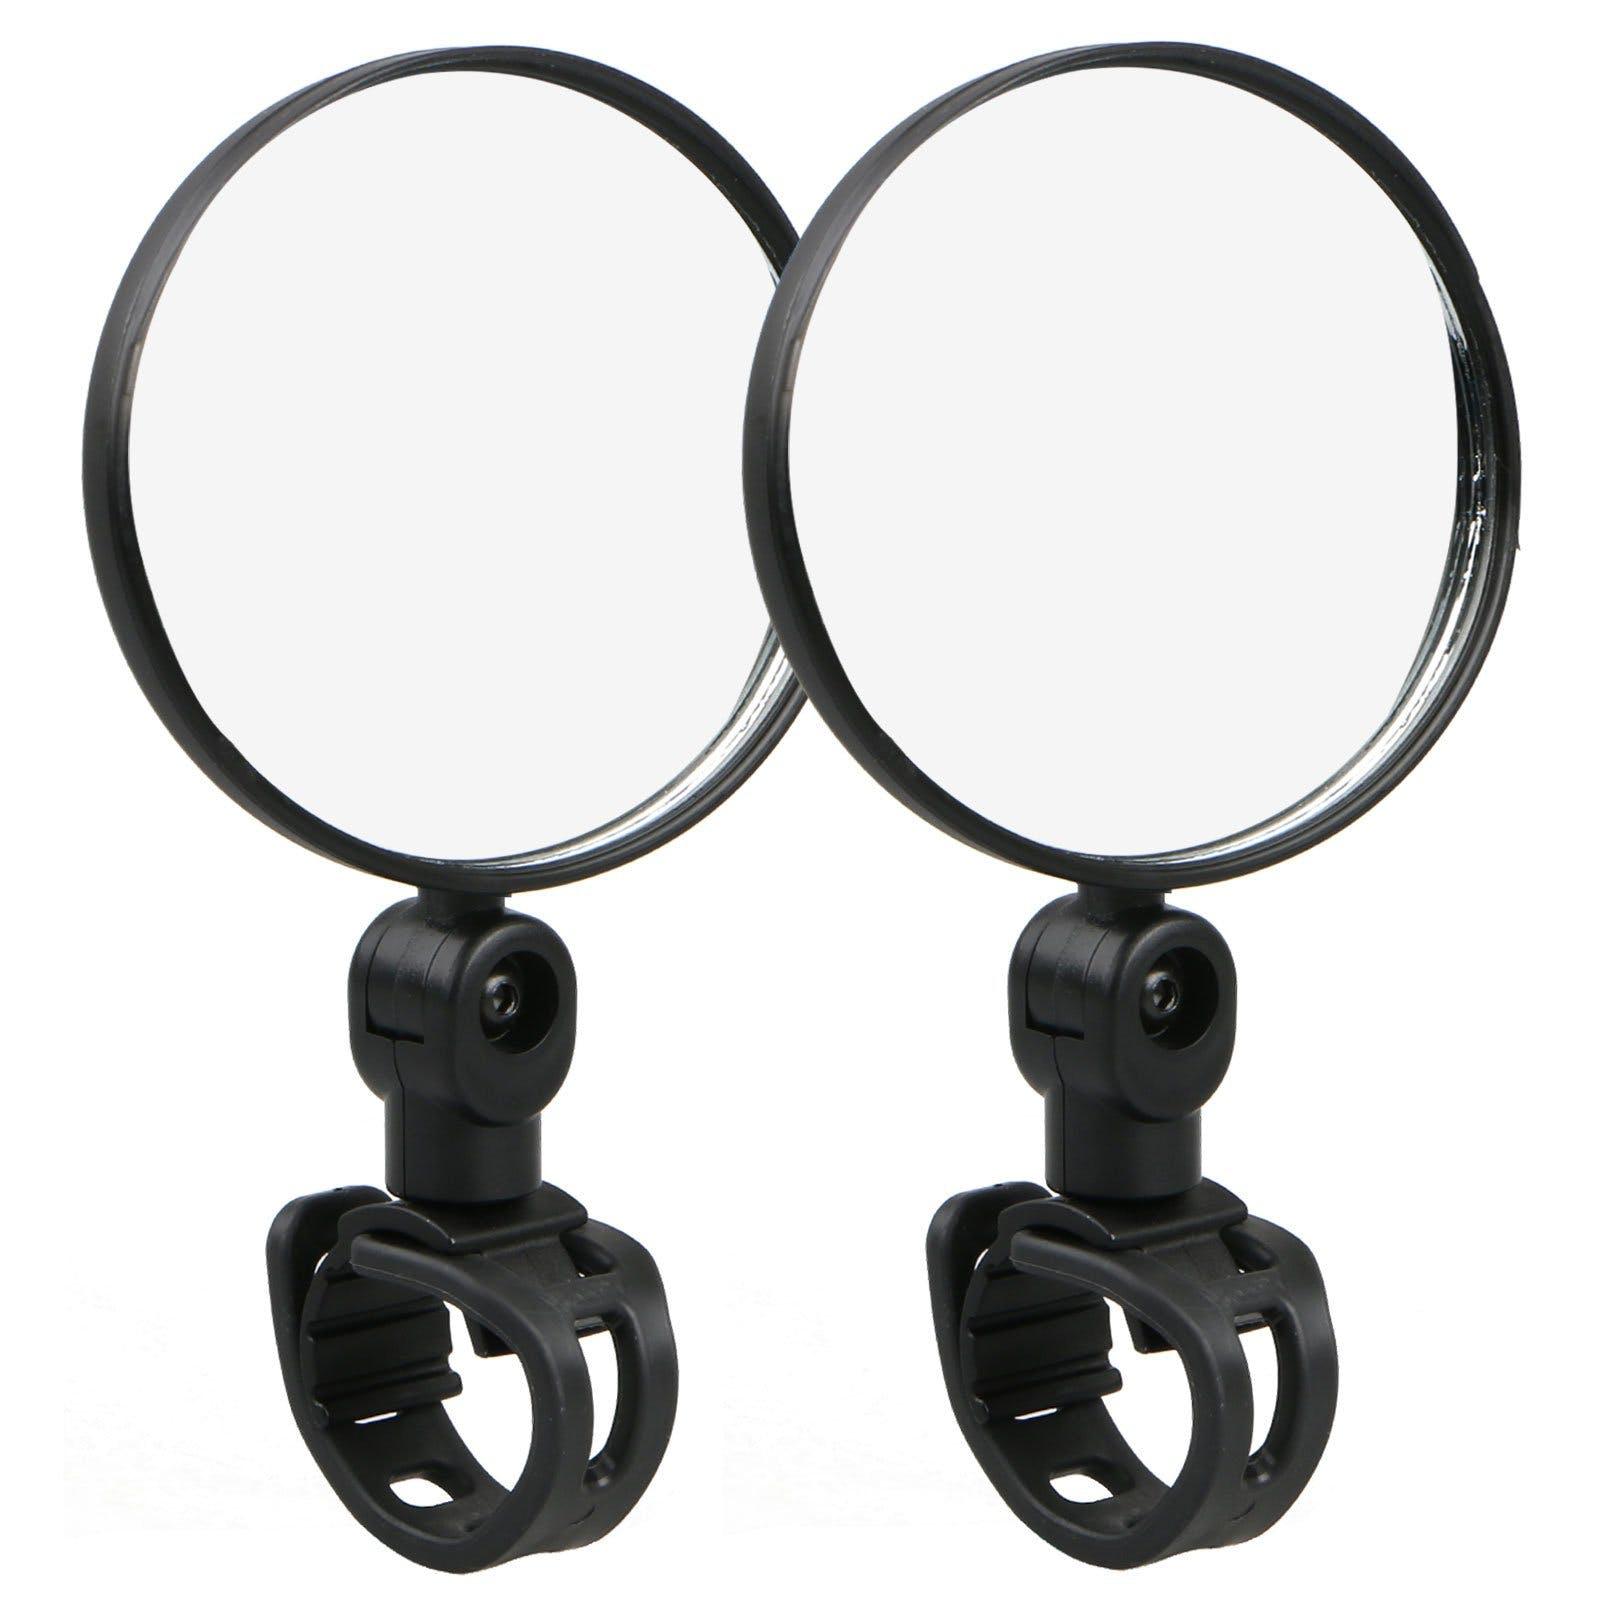 Universal Mini Rotaty Rearview Handlebar Mirror For Bike Bicycle Cycling